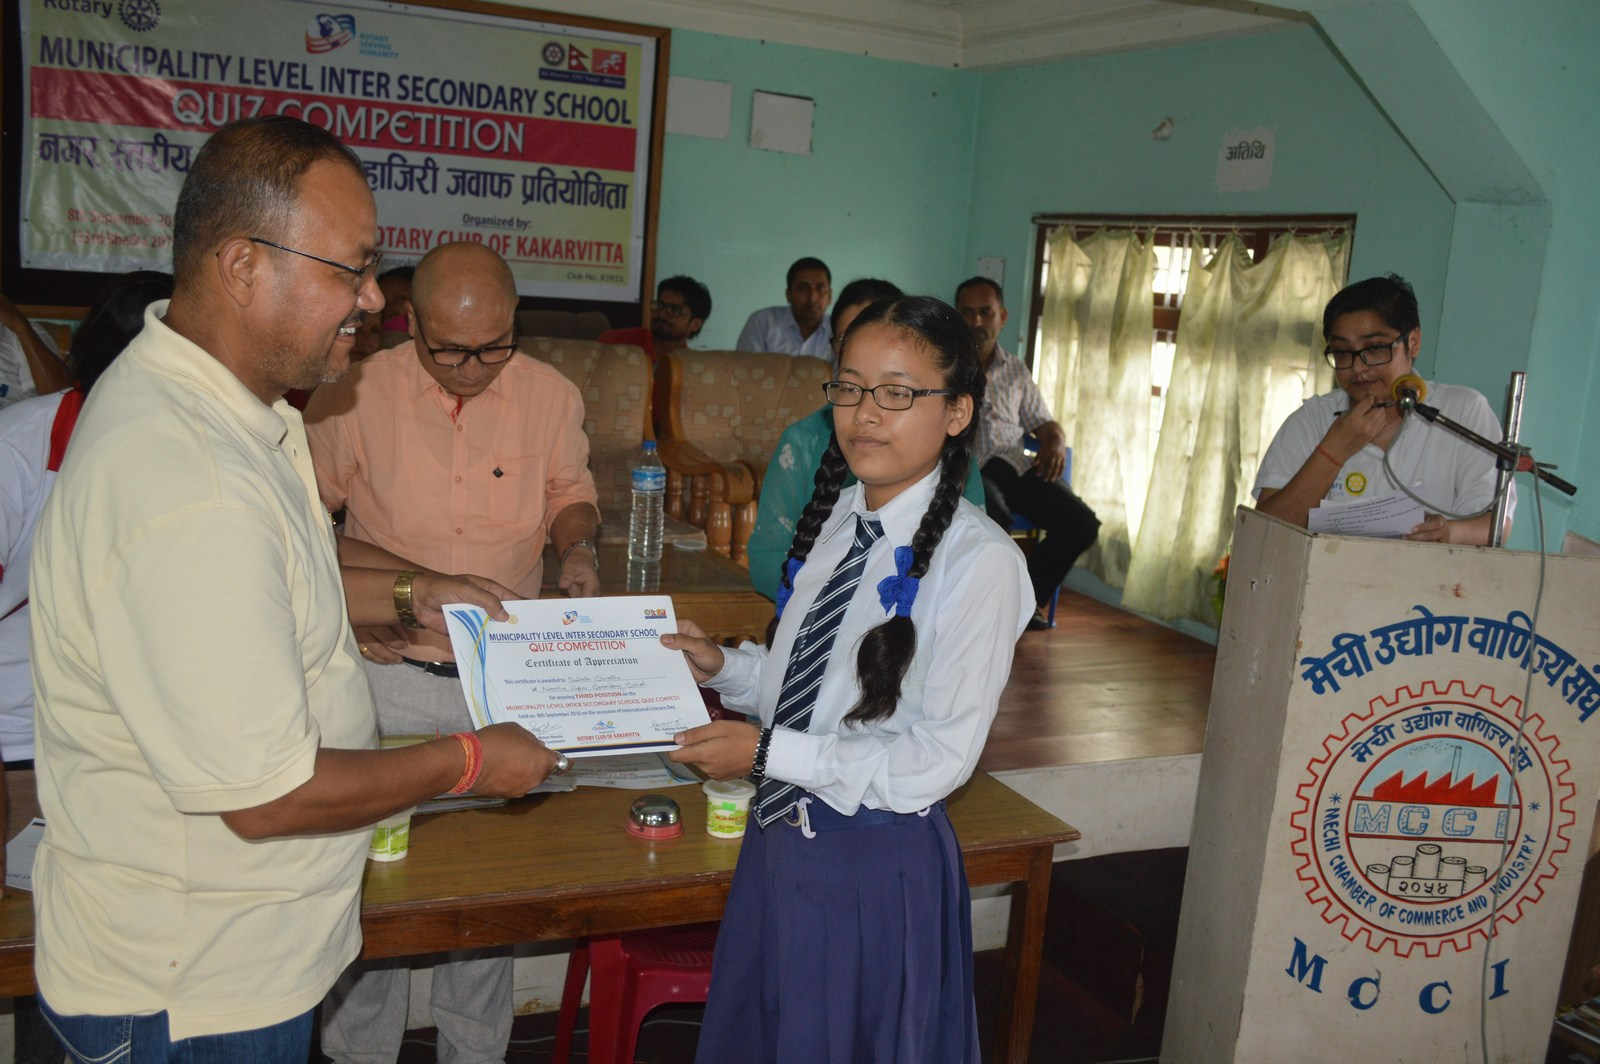 Municipality-Level-Inter-Secondary-School-Quiz-Contest-2016-Rotary-Club-of-Kakarvitta-55